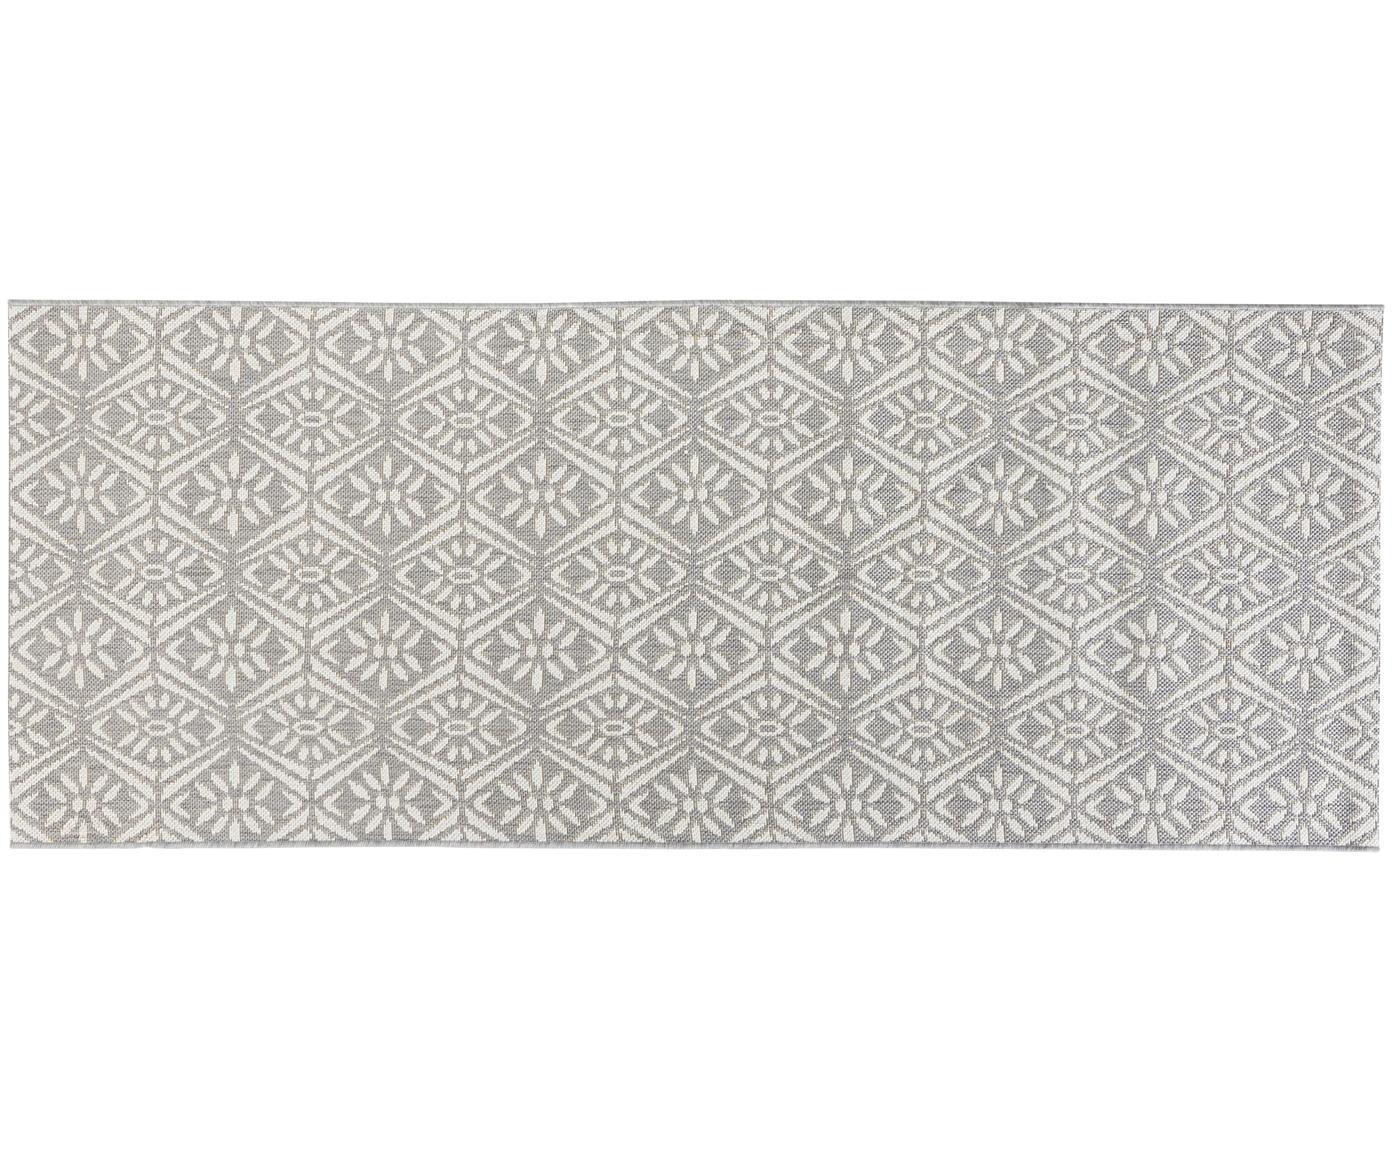 Alfombra Creation, Gris, crema, An 80 x L 200 cm